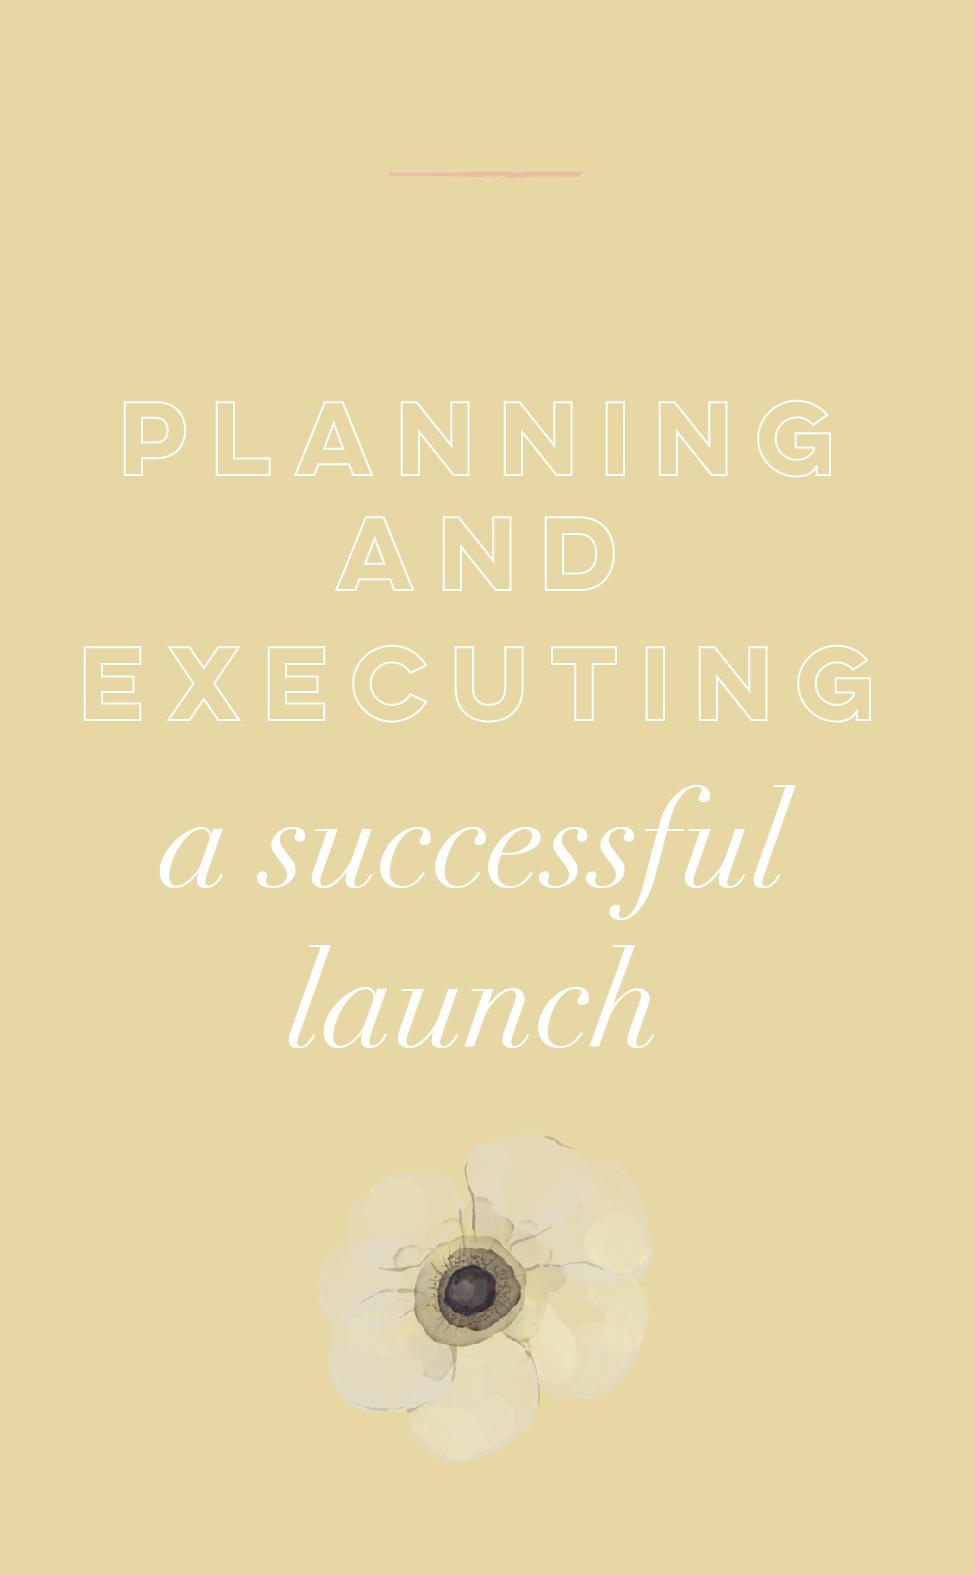 planningasuccessfullaunch.jpg